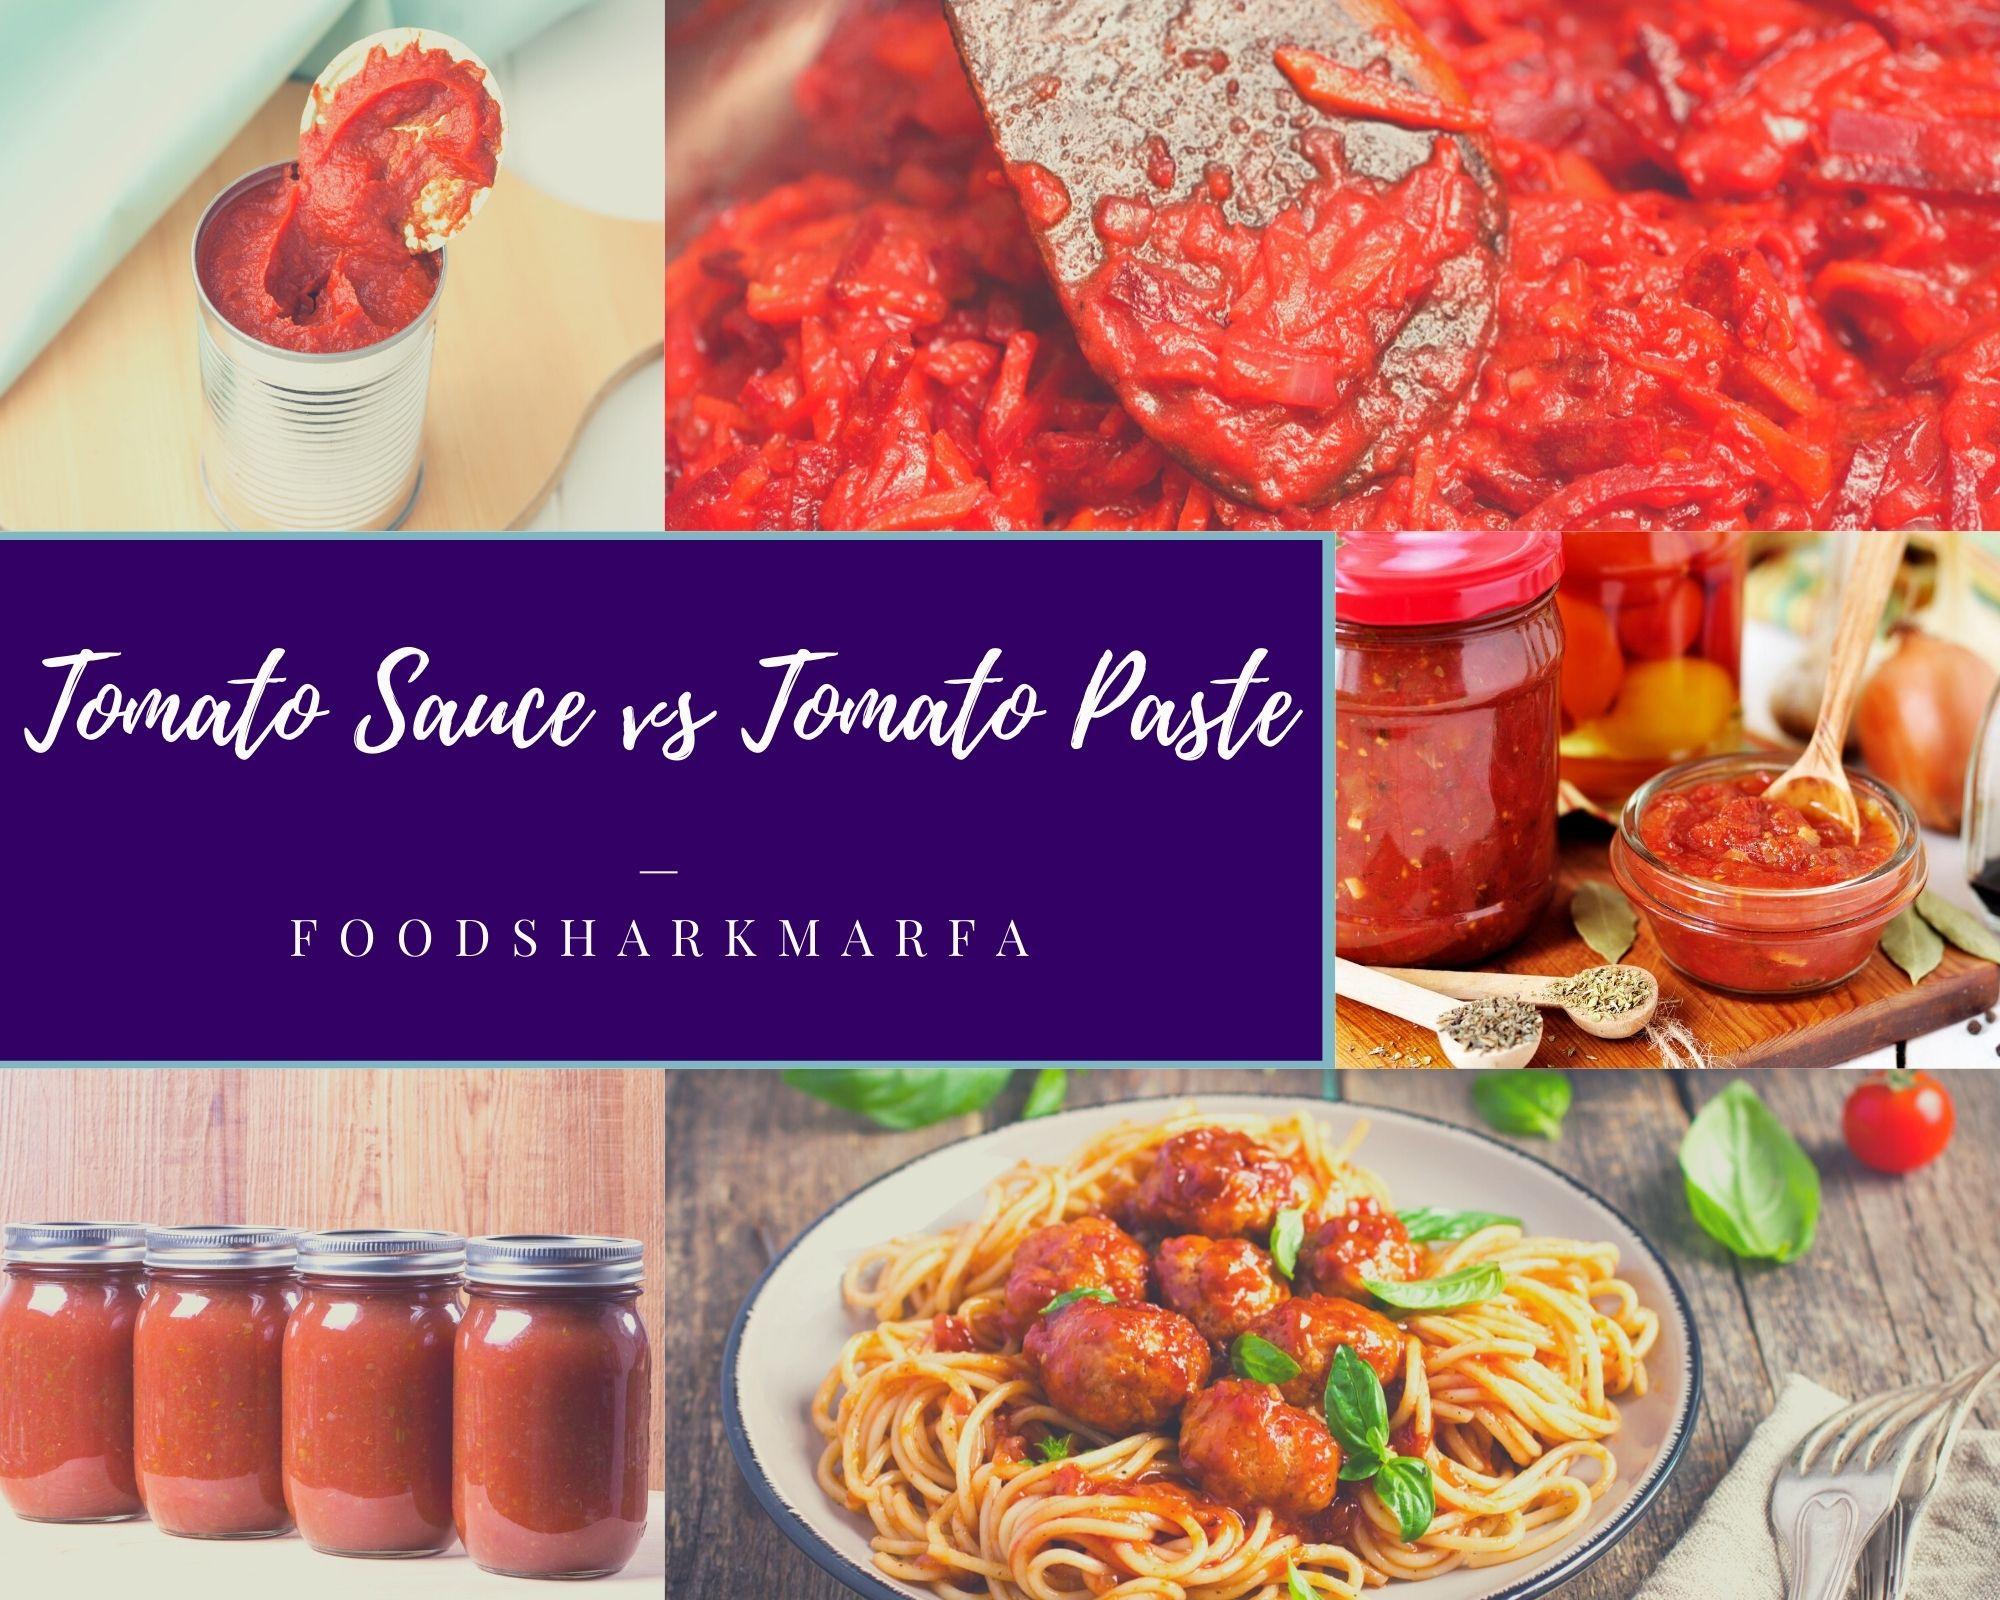 Tomato Sauce vs Tomato Paste